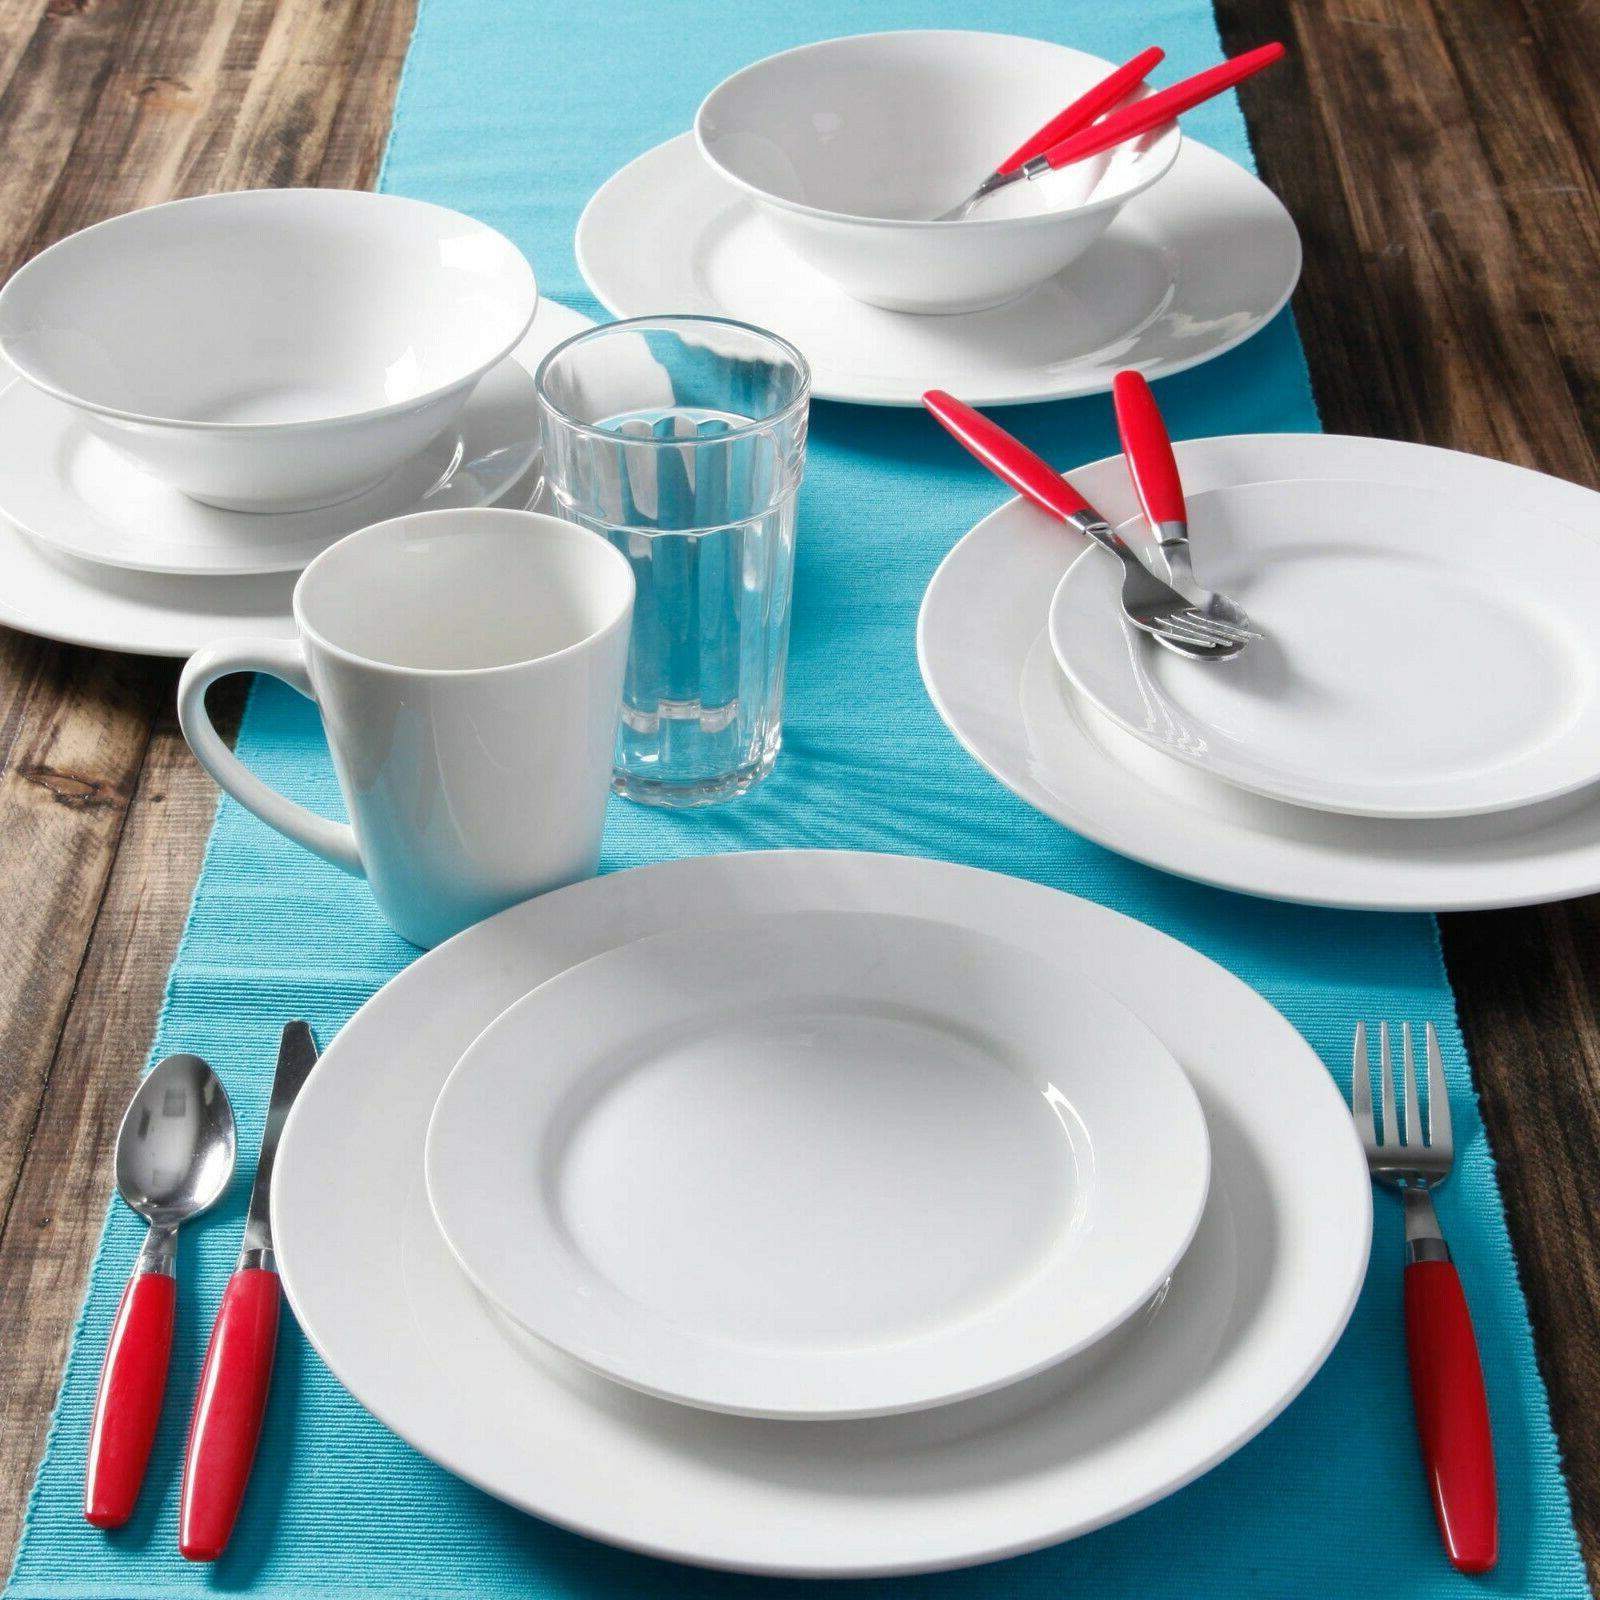 Gibson Home II Dinnerware Set,